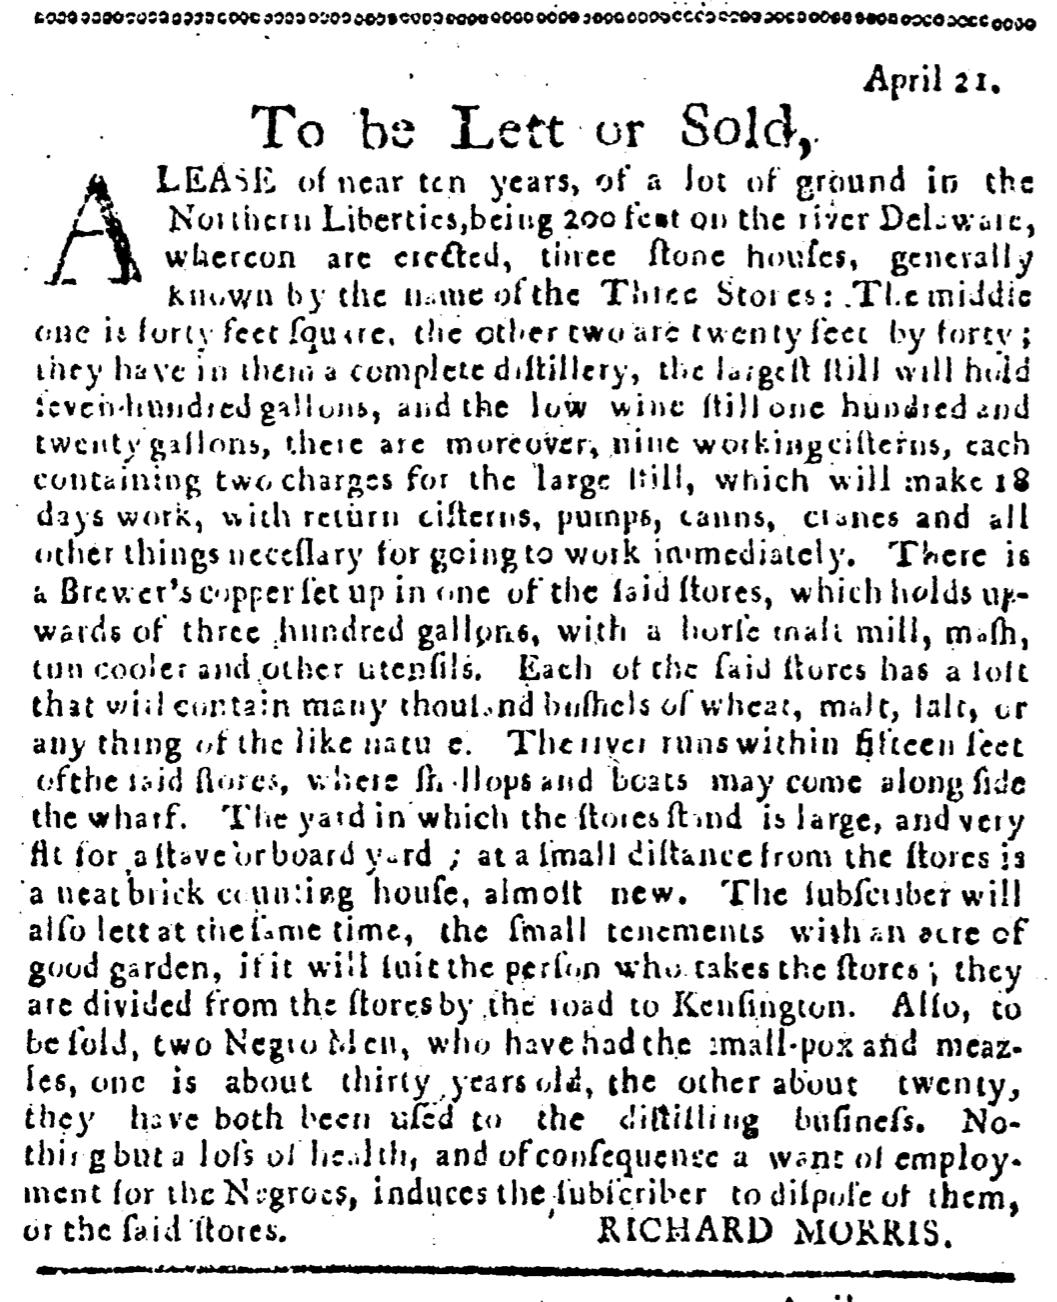 Jul 21 - Pennsylvania Journal Supplement Slavery 1